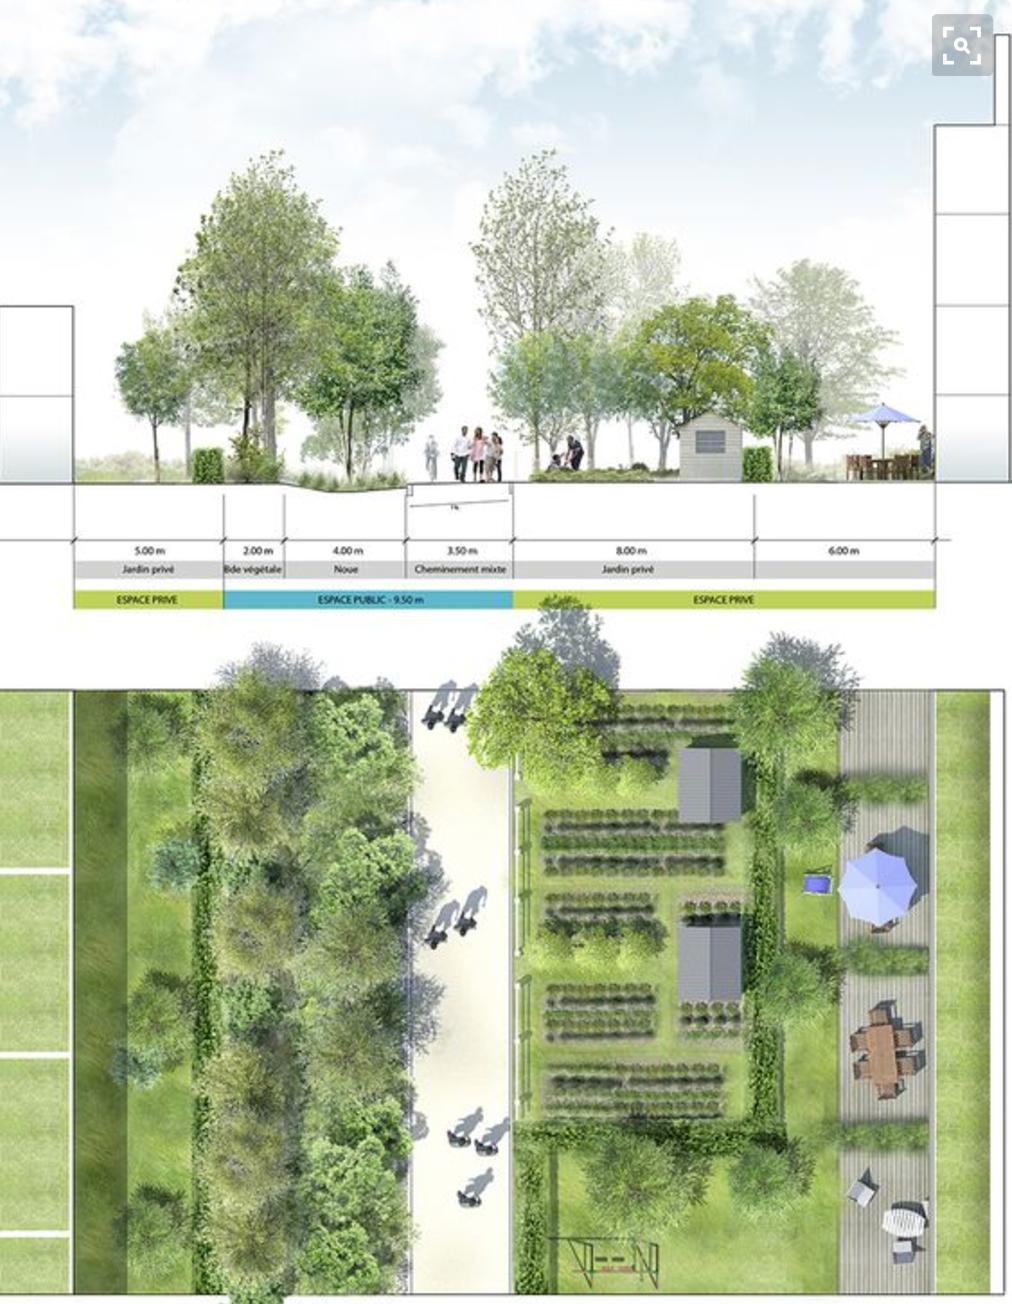 Pin de aurora alcaide en sections pinterest paisajes for Equipamiento urbano arquitectura pdf